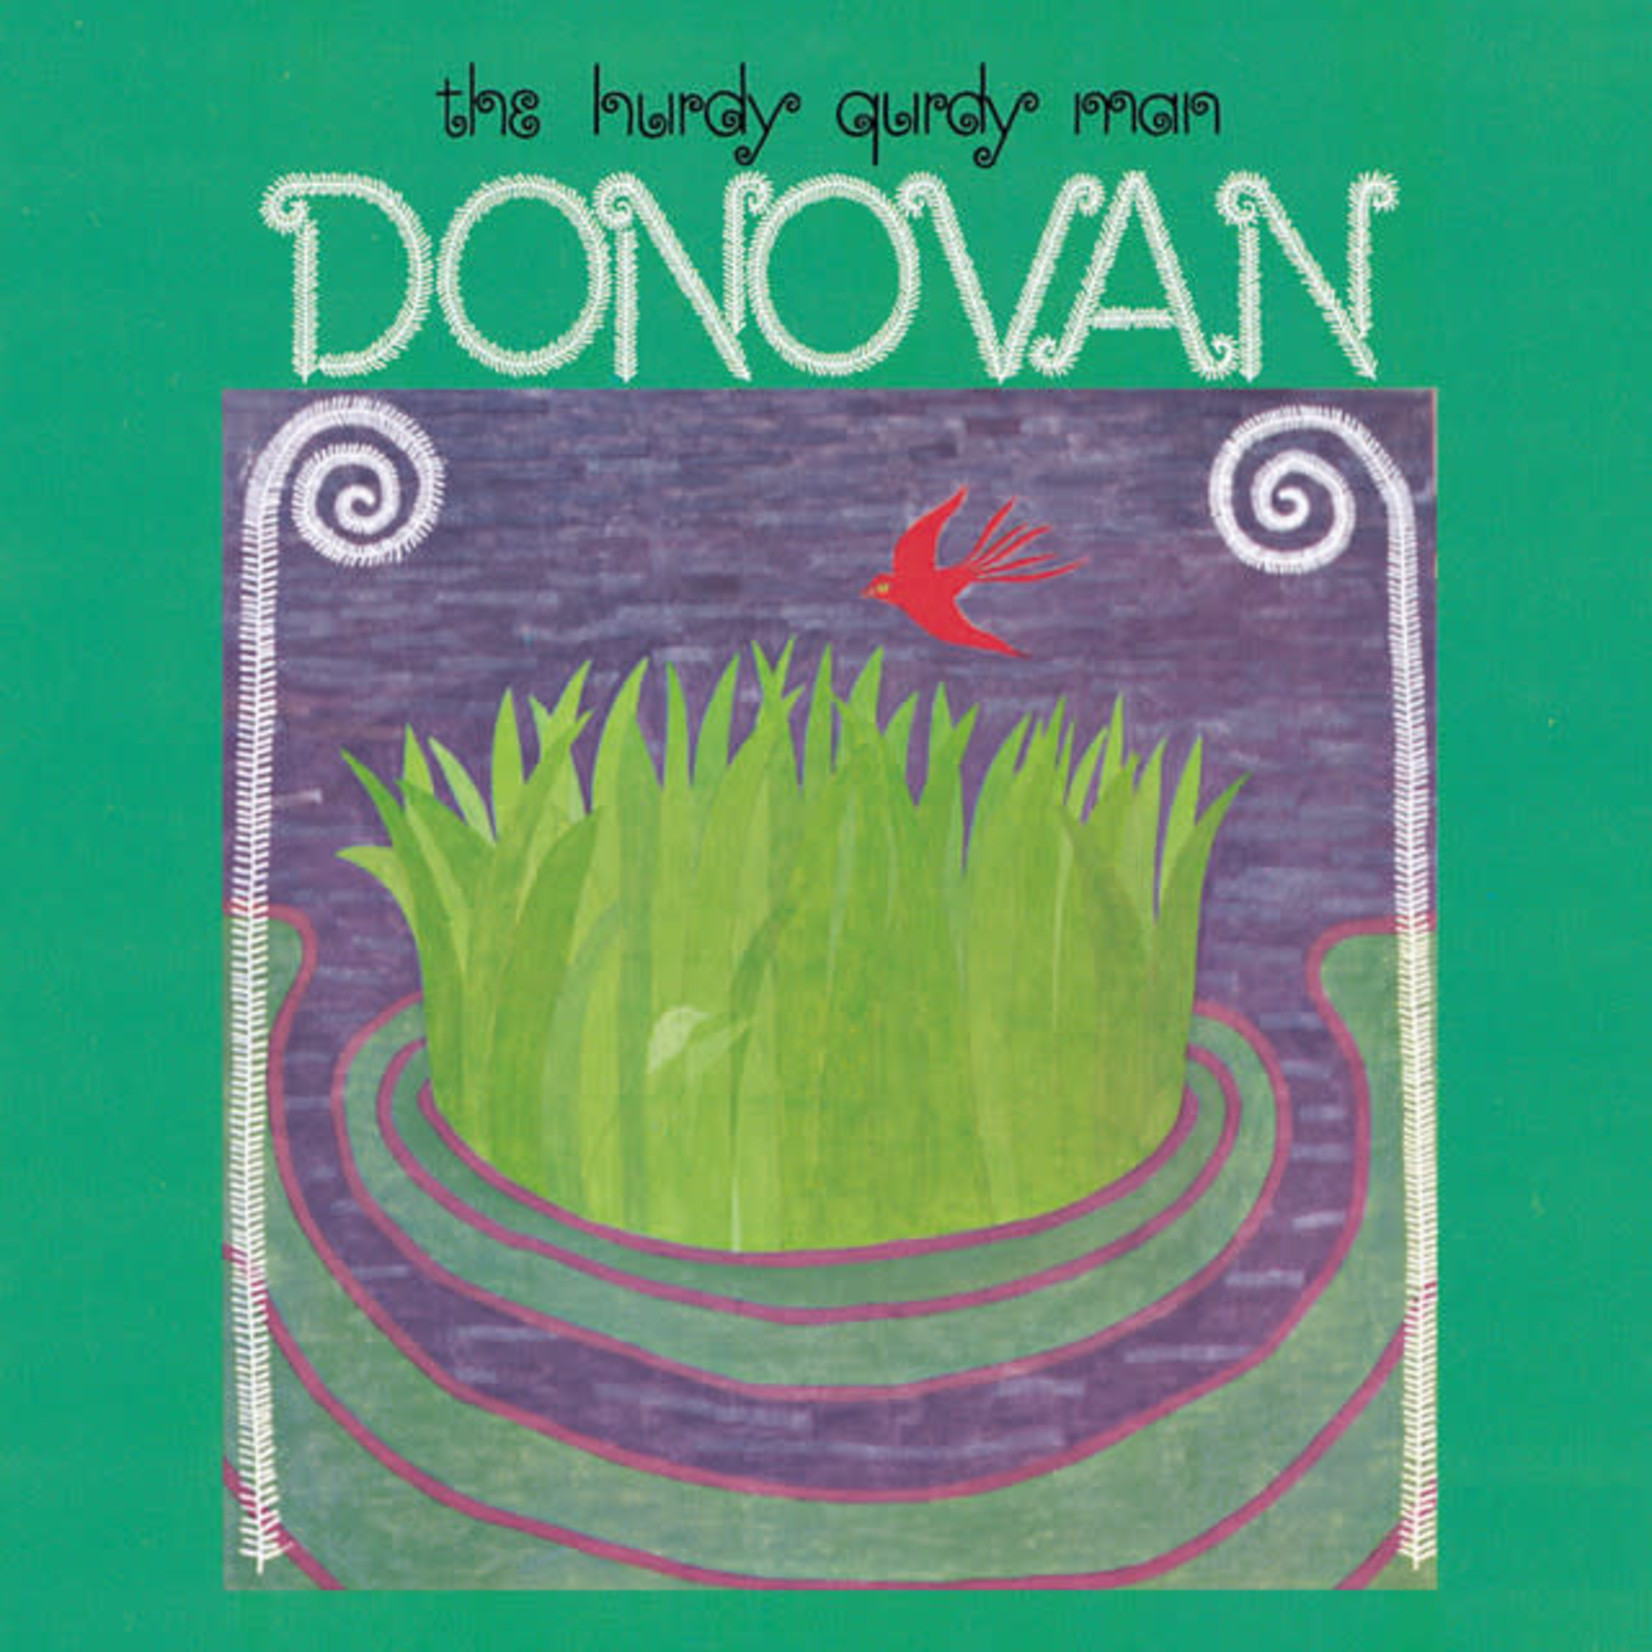 Vinyl Donovan - The Hurdy Gurdy Man